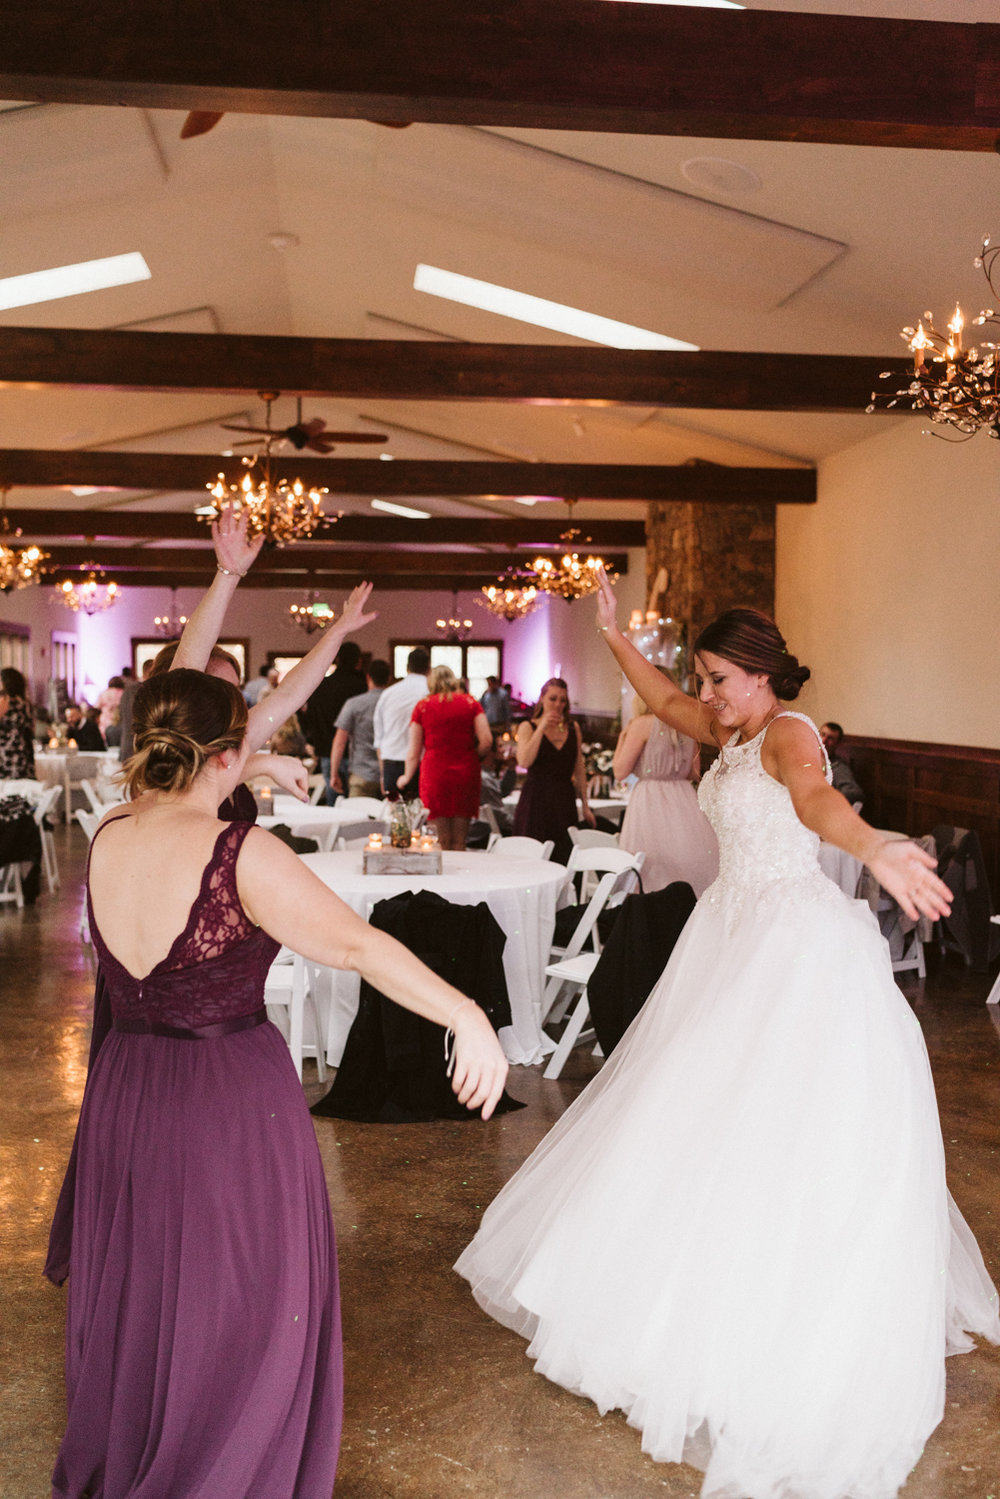 April Yentas Photography - jen and anthony wedding-77.jpg